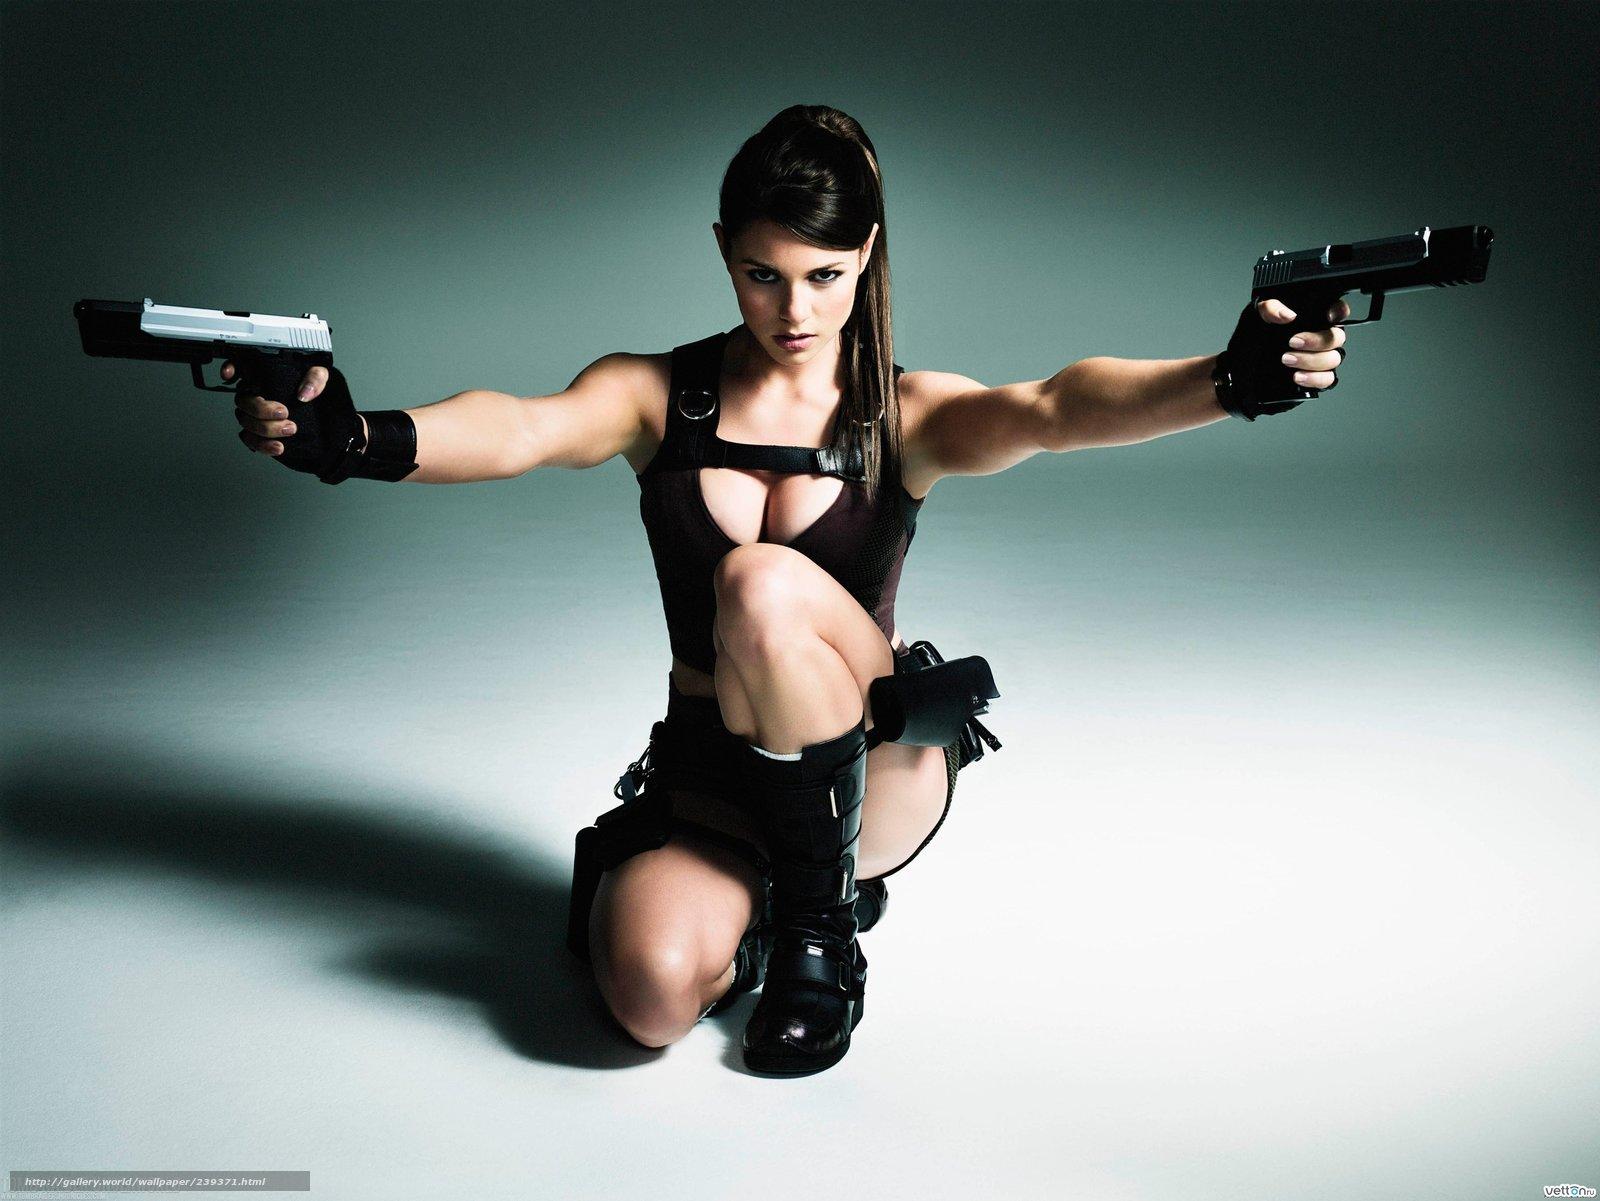 Resident evil 4 pono xxx image